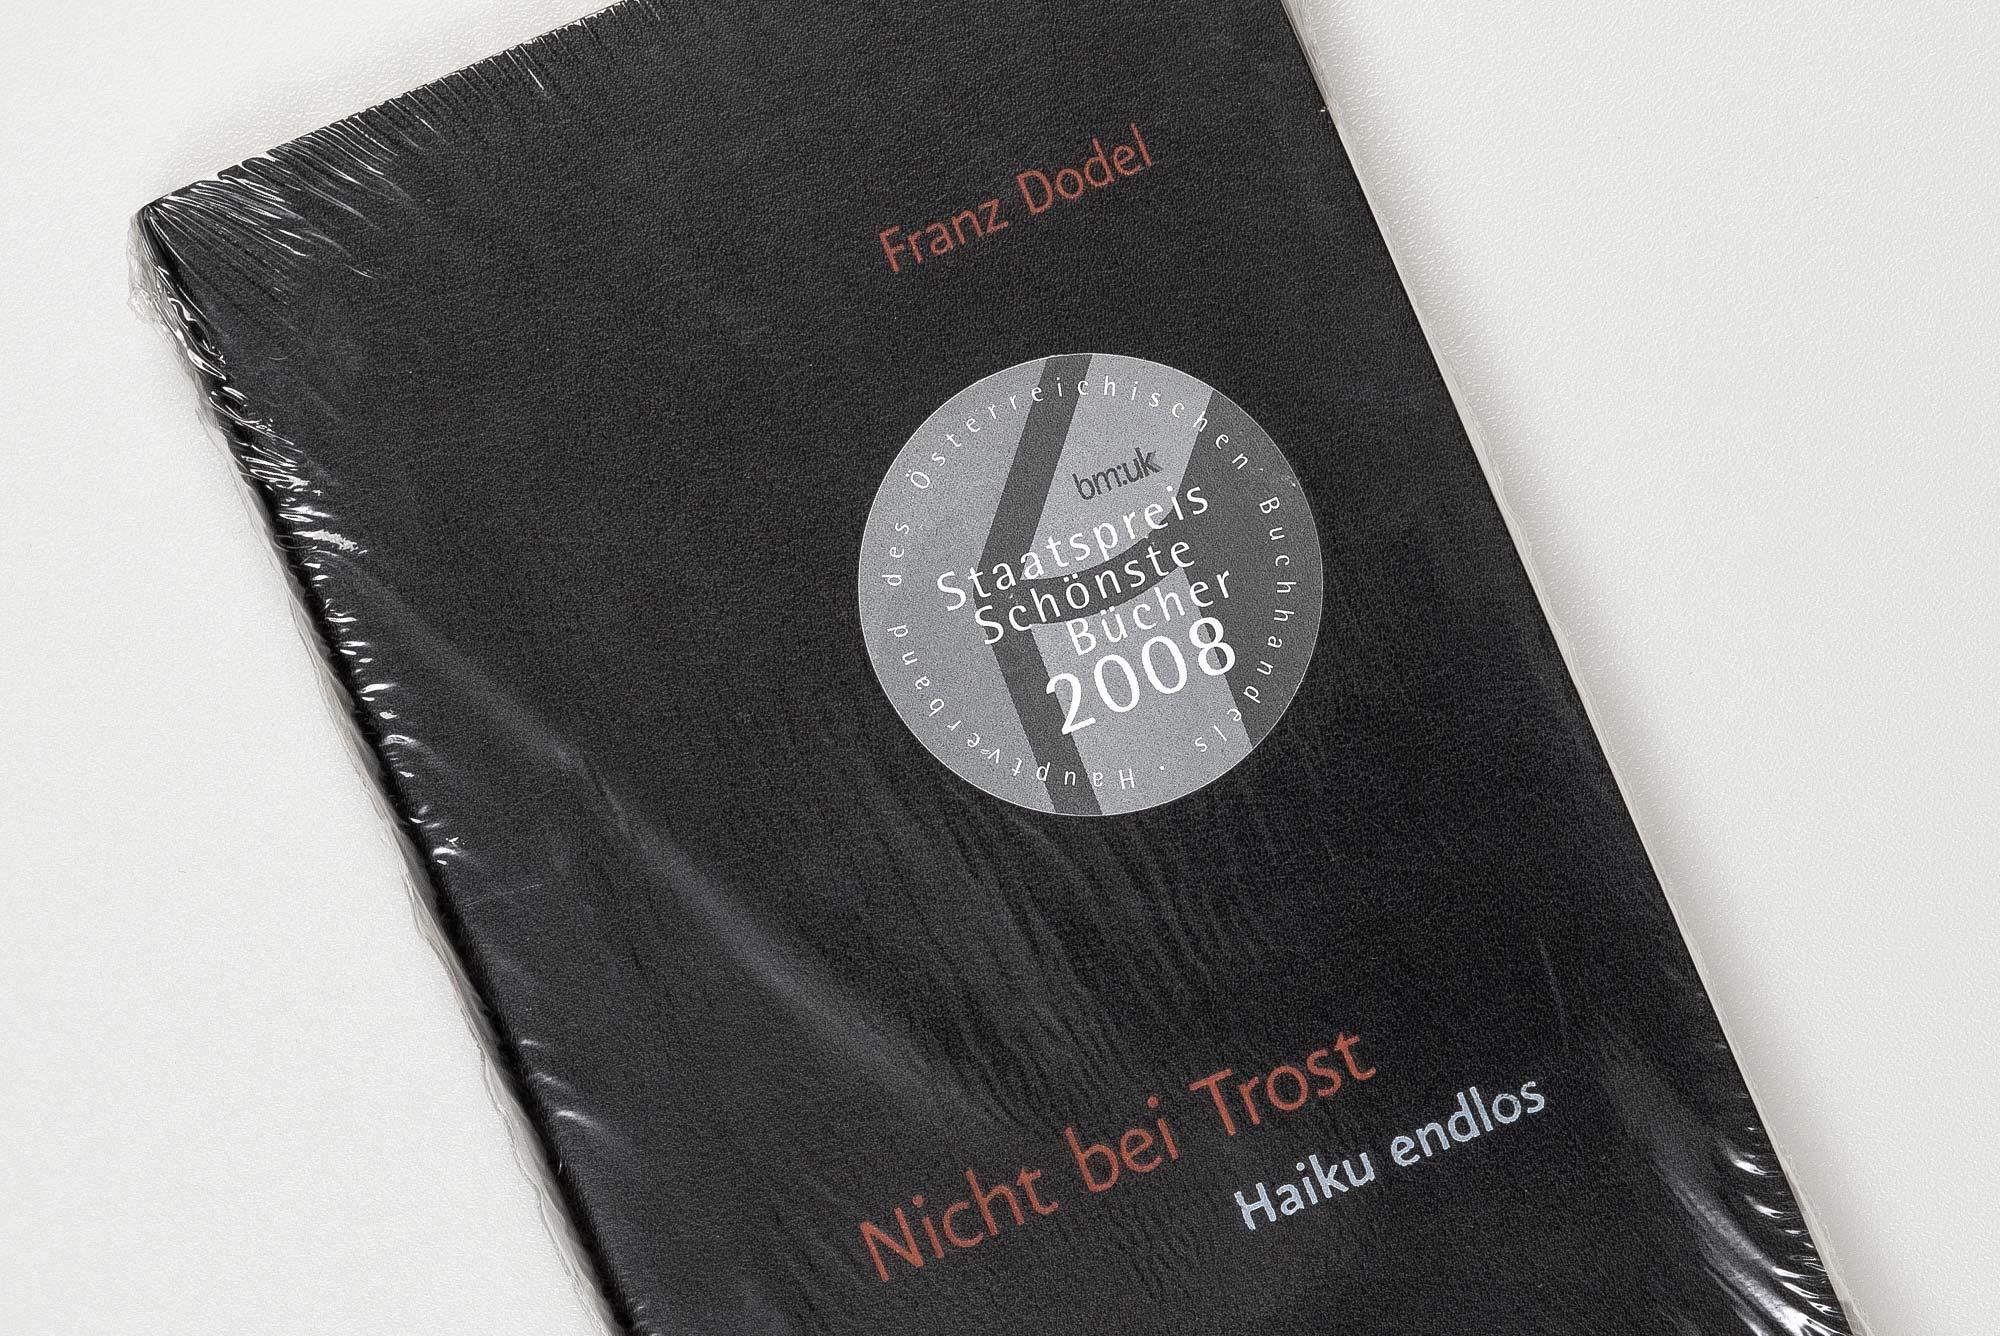 Frand Dodel – Nicht bei Trost, book cover ©Atelier Pol